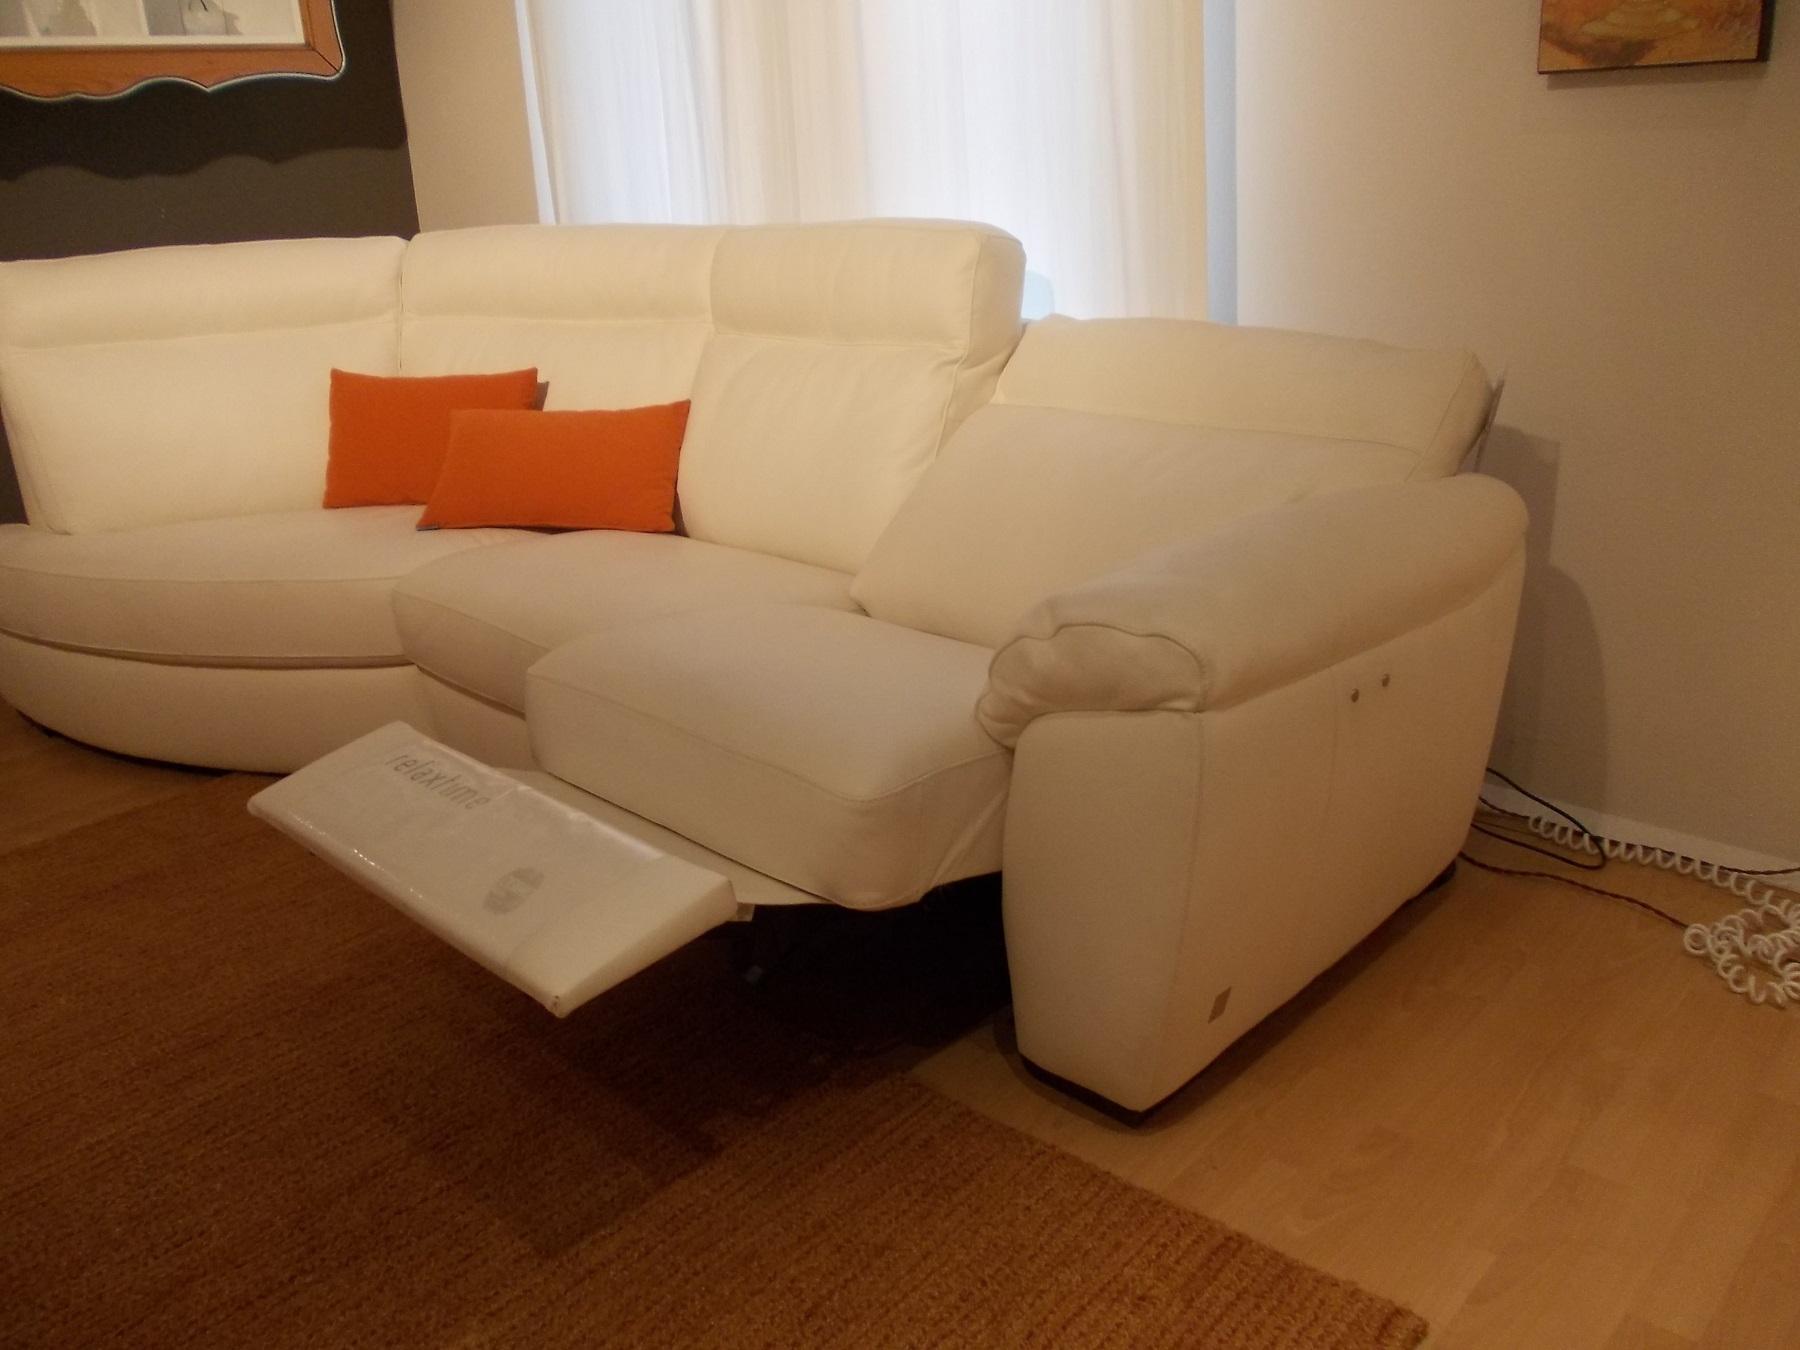 Divano Doimo Sofas Charles Divano relax Pelle - Divani a prezzi scontati